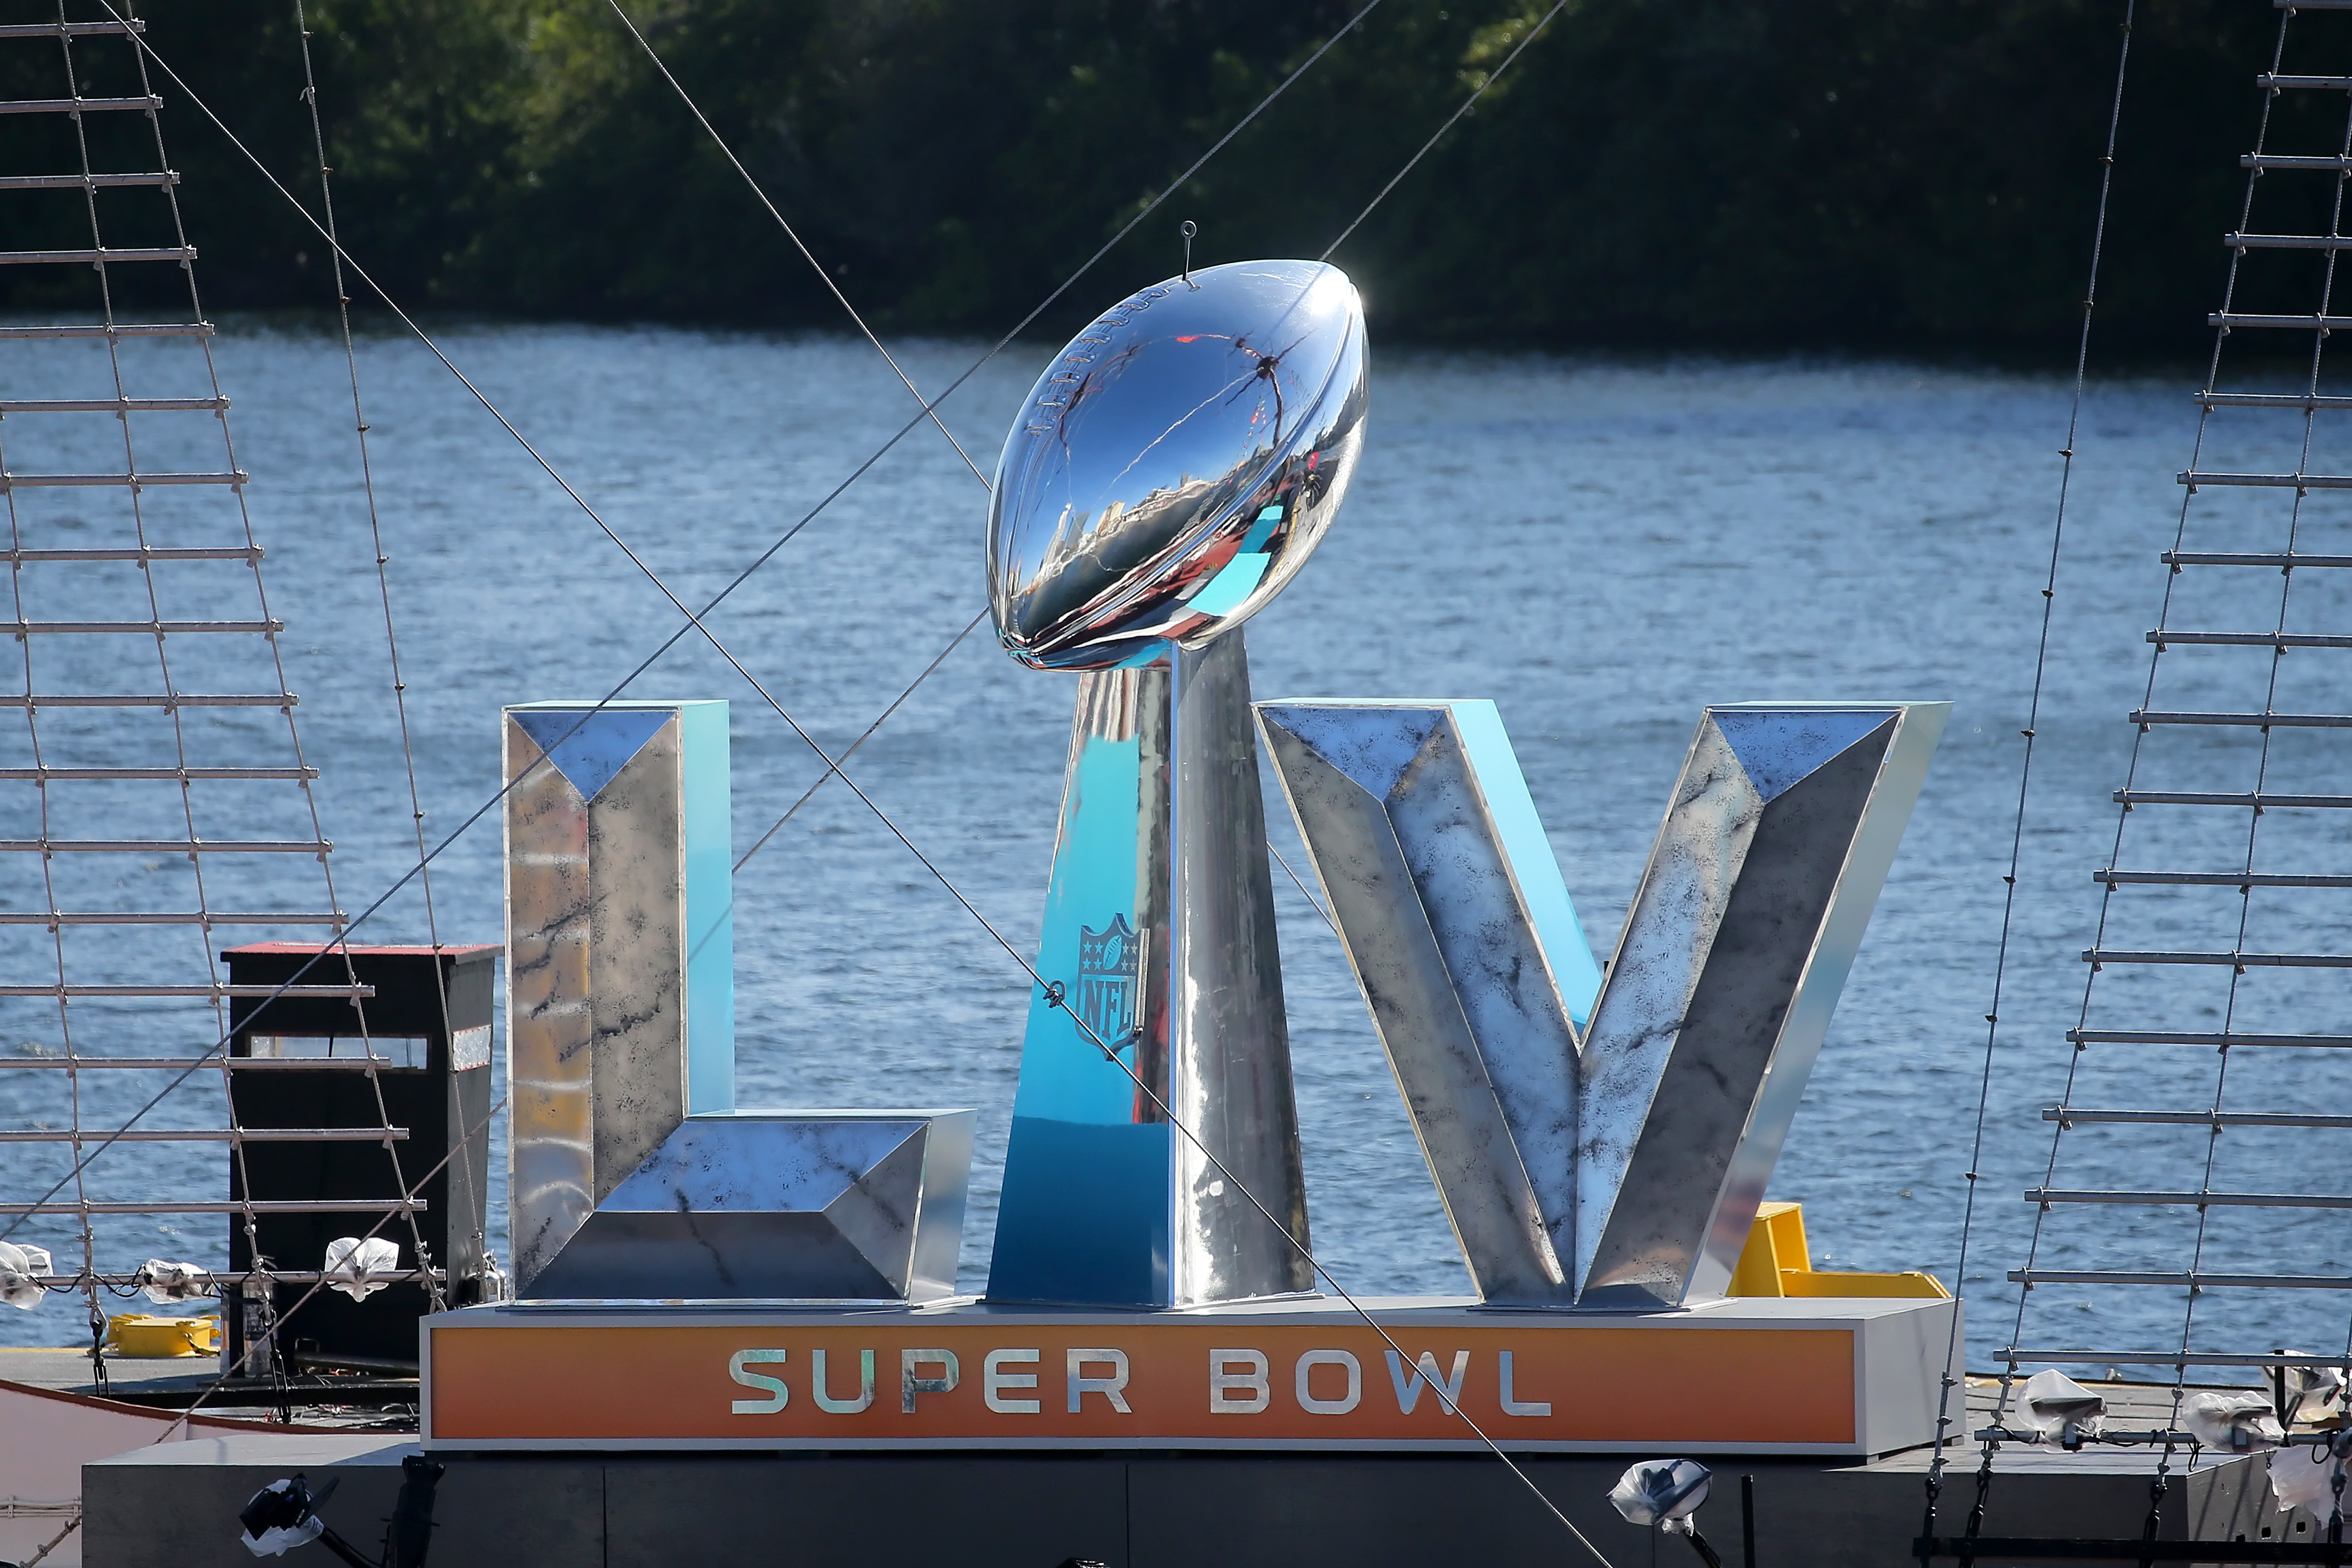 NFL: FEB 02 Super Bowl LV Preview